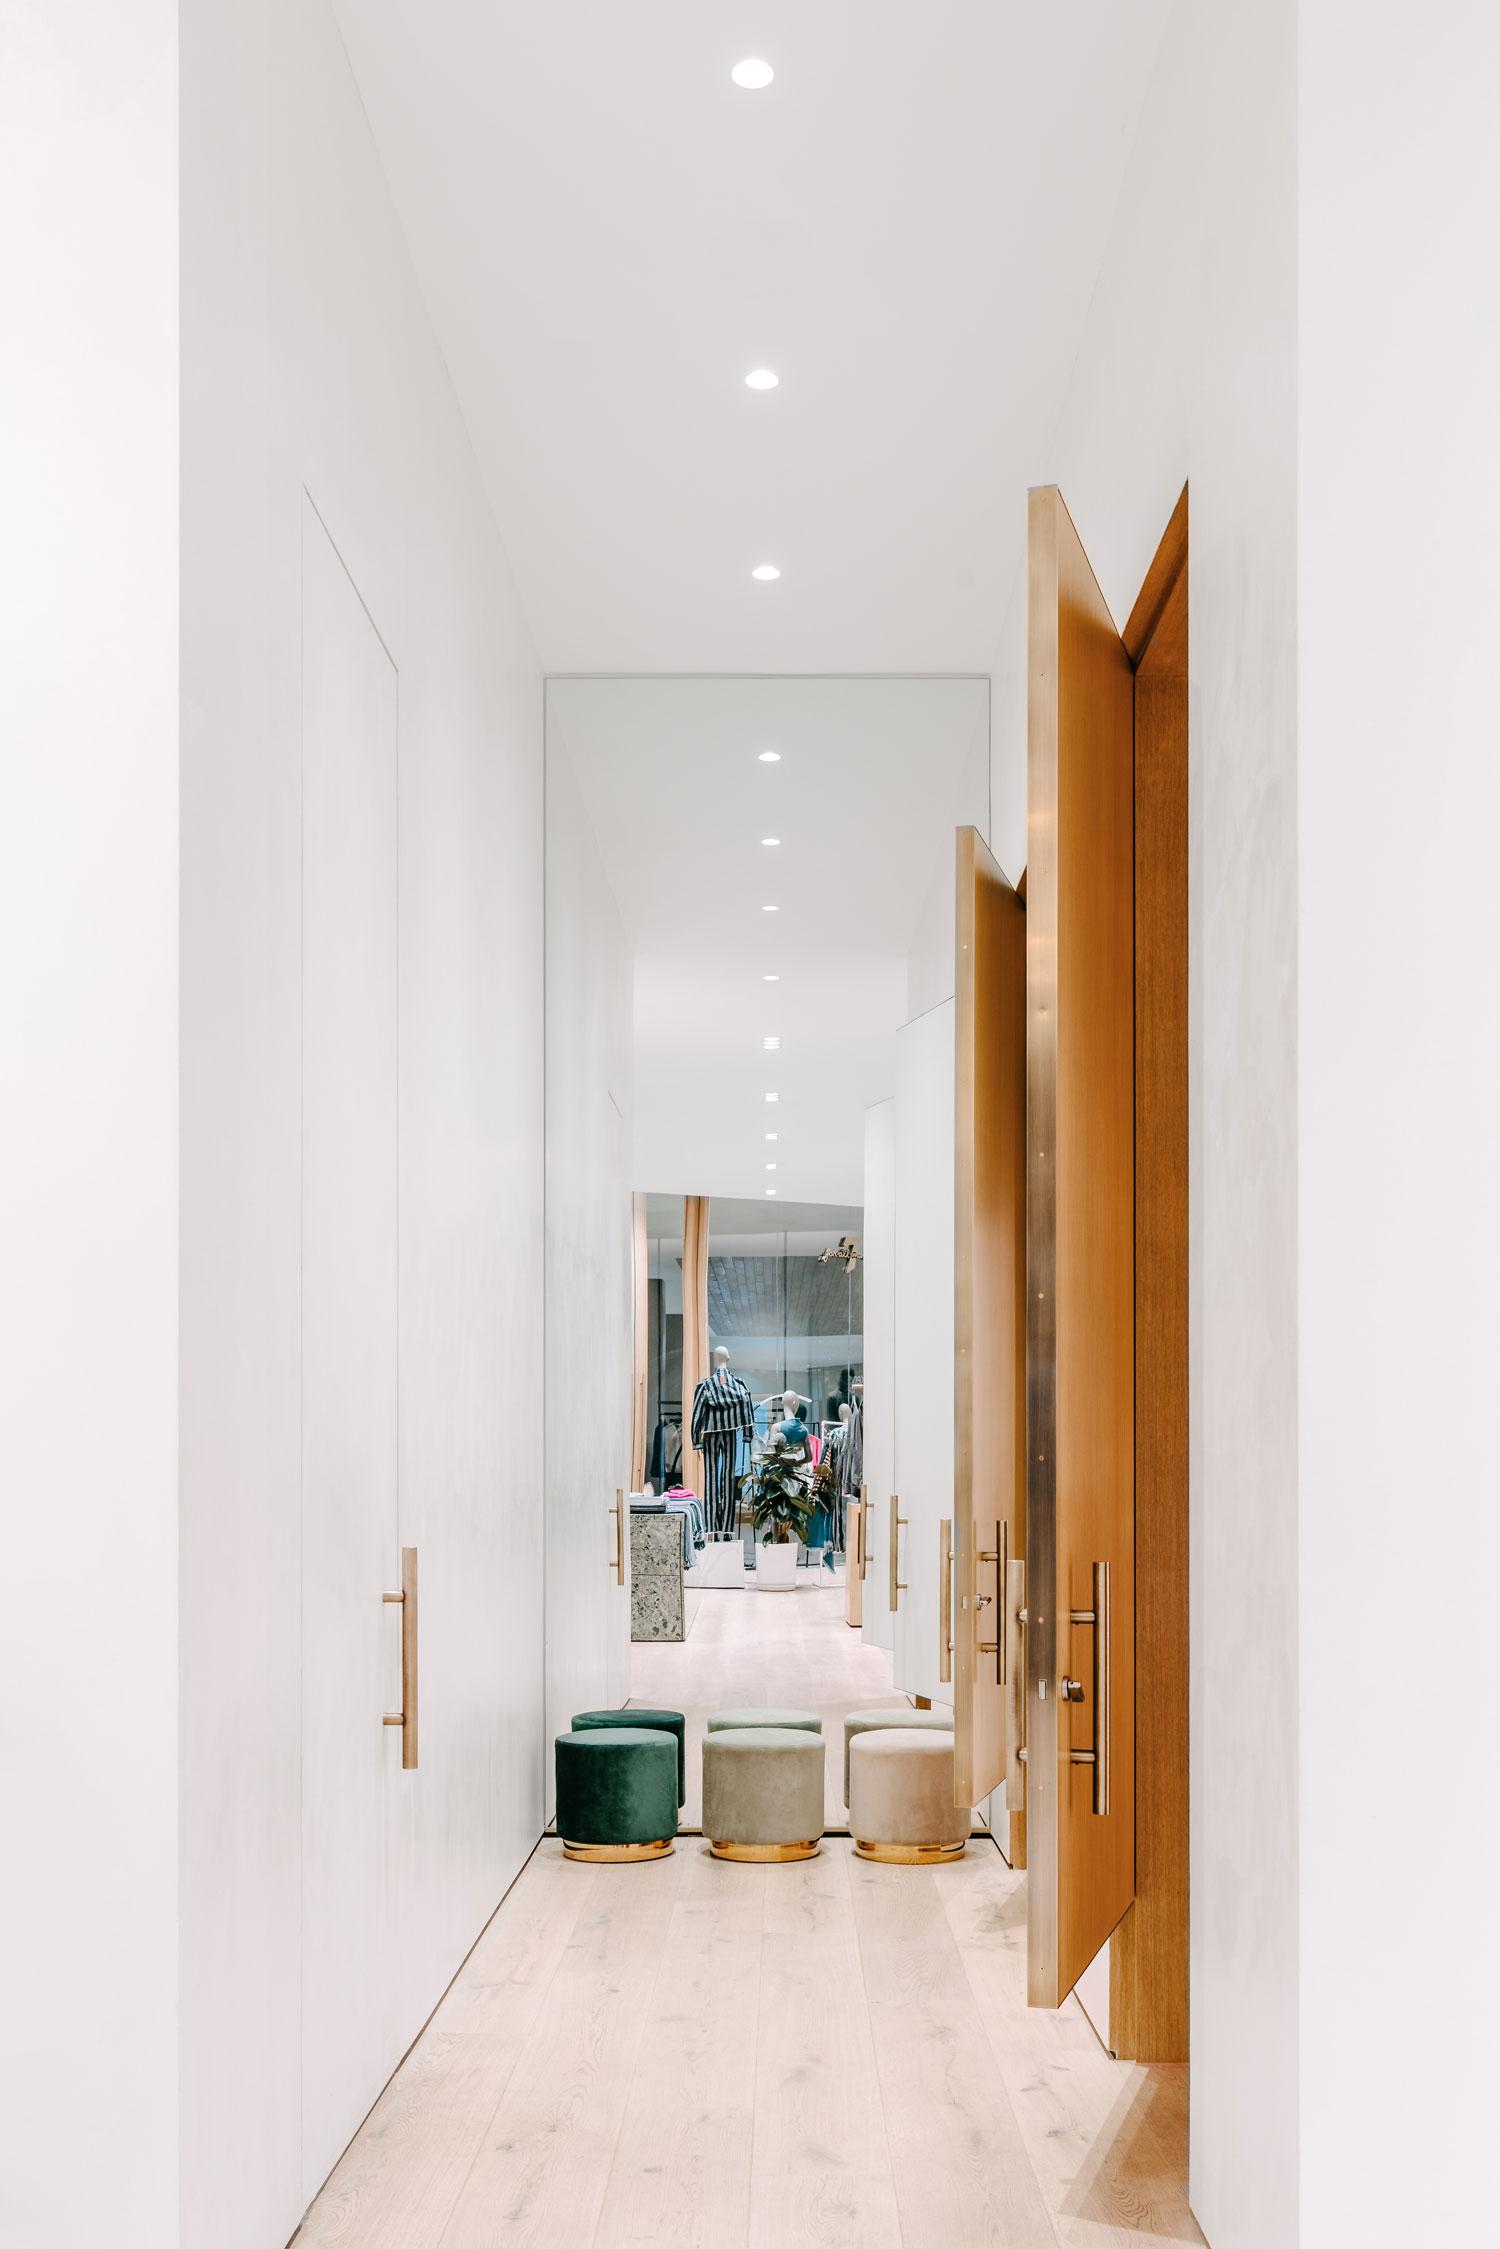 ww-7fam-dressing-room-02.jpg